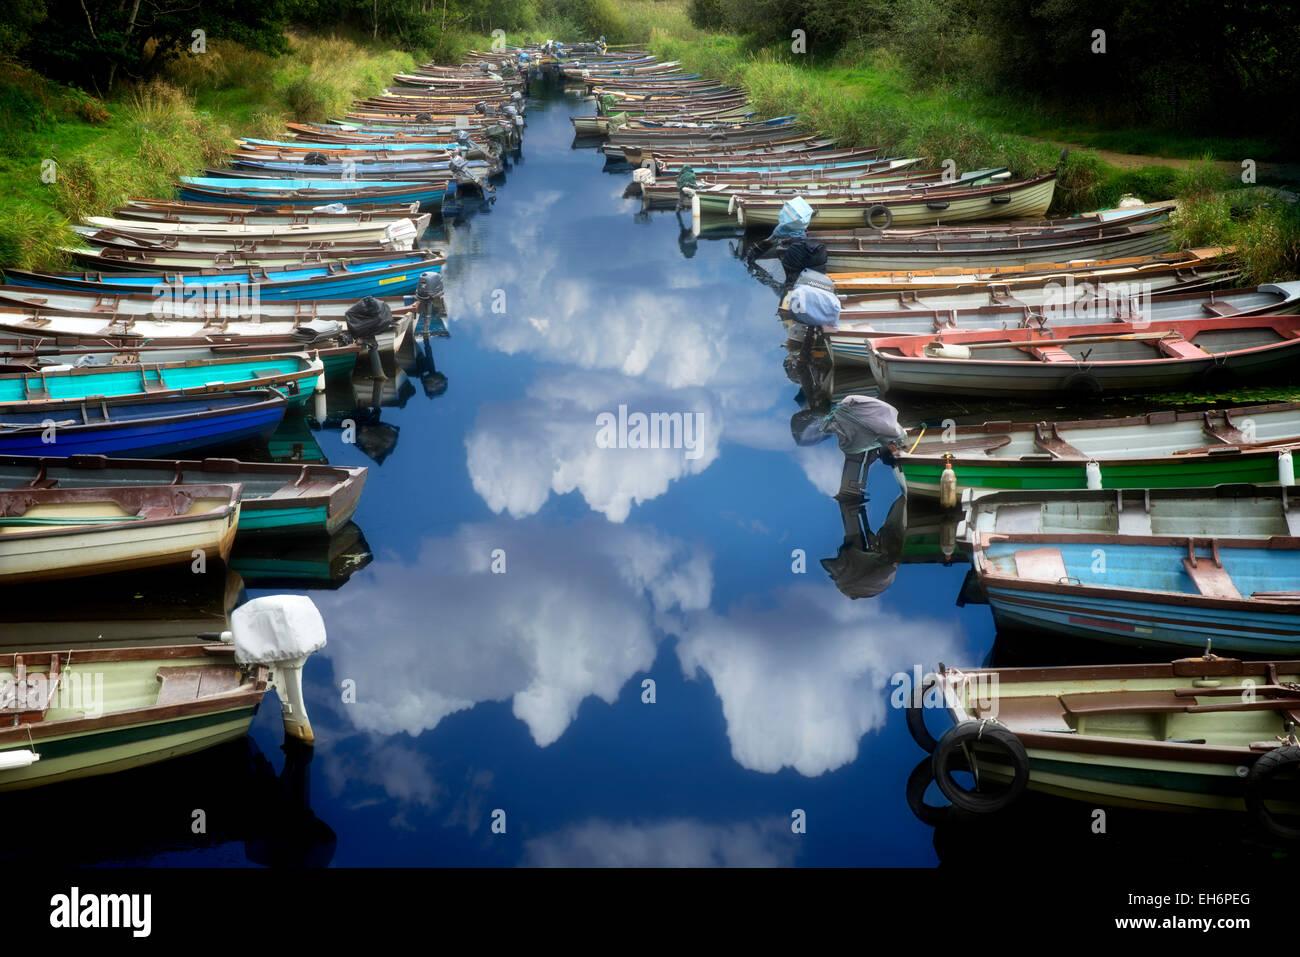 National immagini national fotos stock alamy for Cabine del fiume kenai soldotna ak